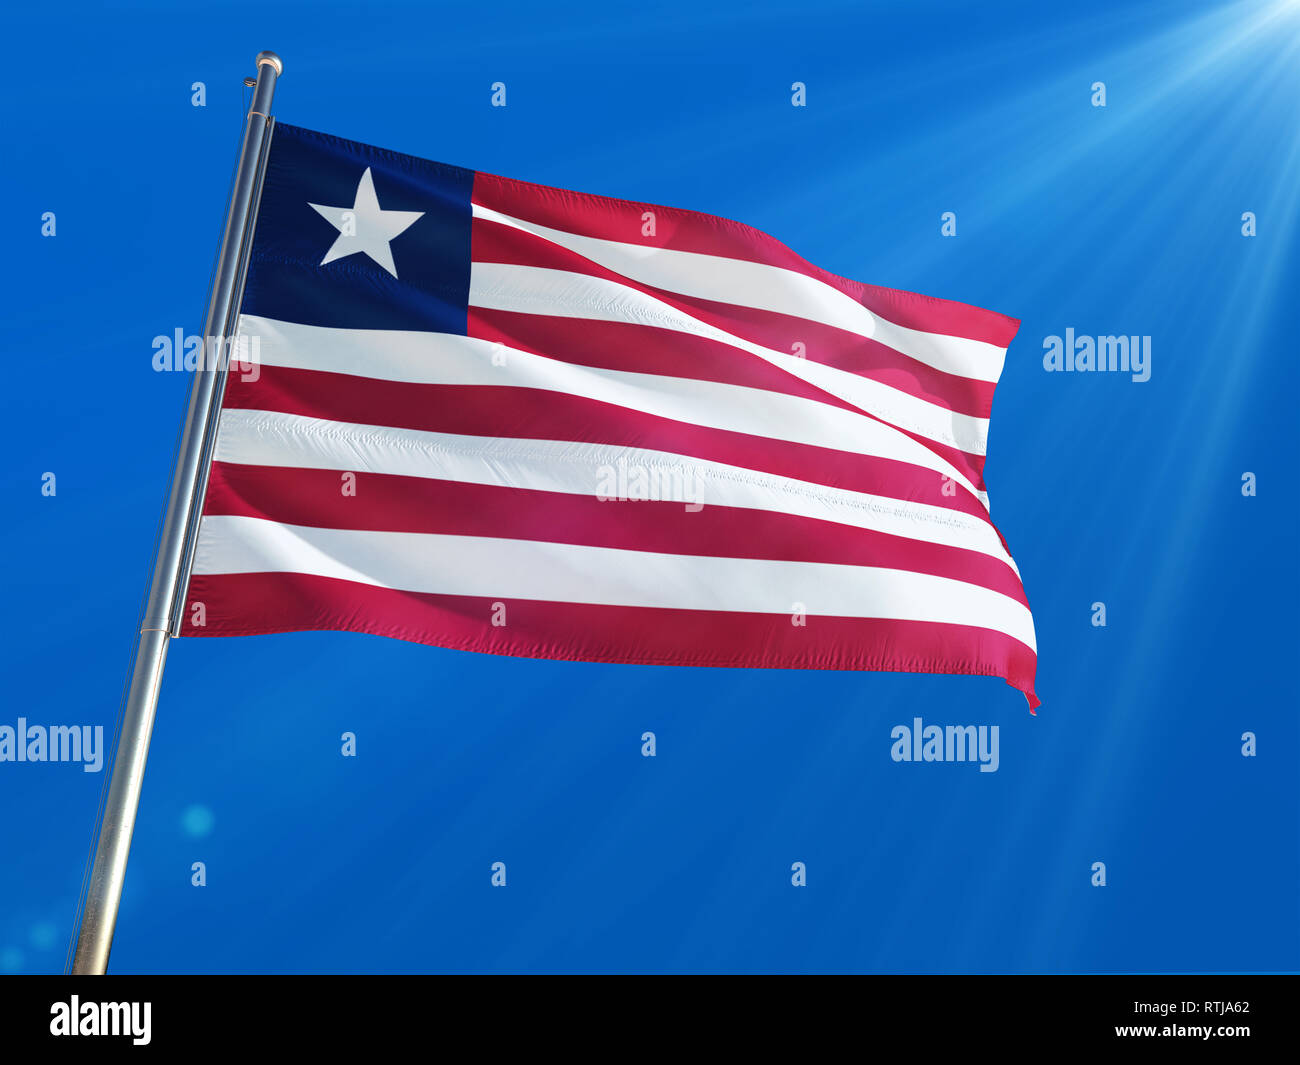 Liberia National Flag Waving on pole against deep blue sky background. High Definition - Stock Image